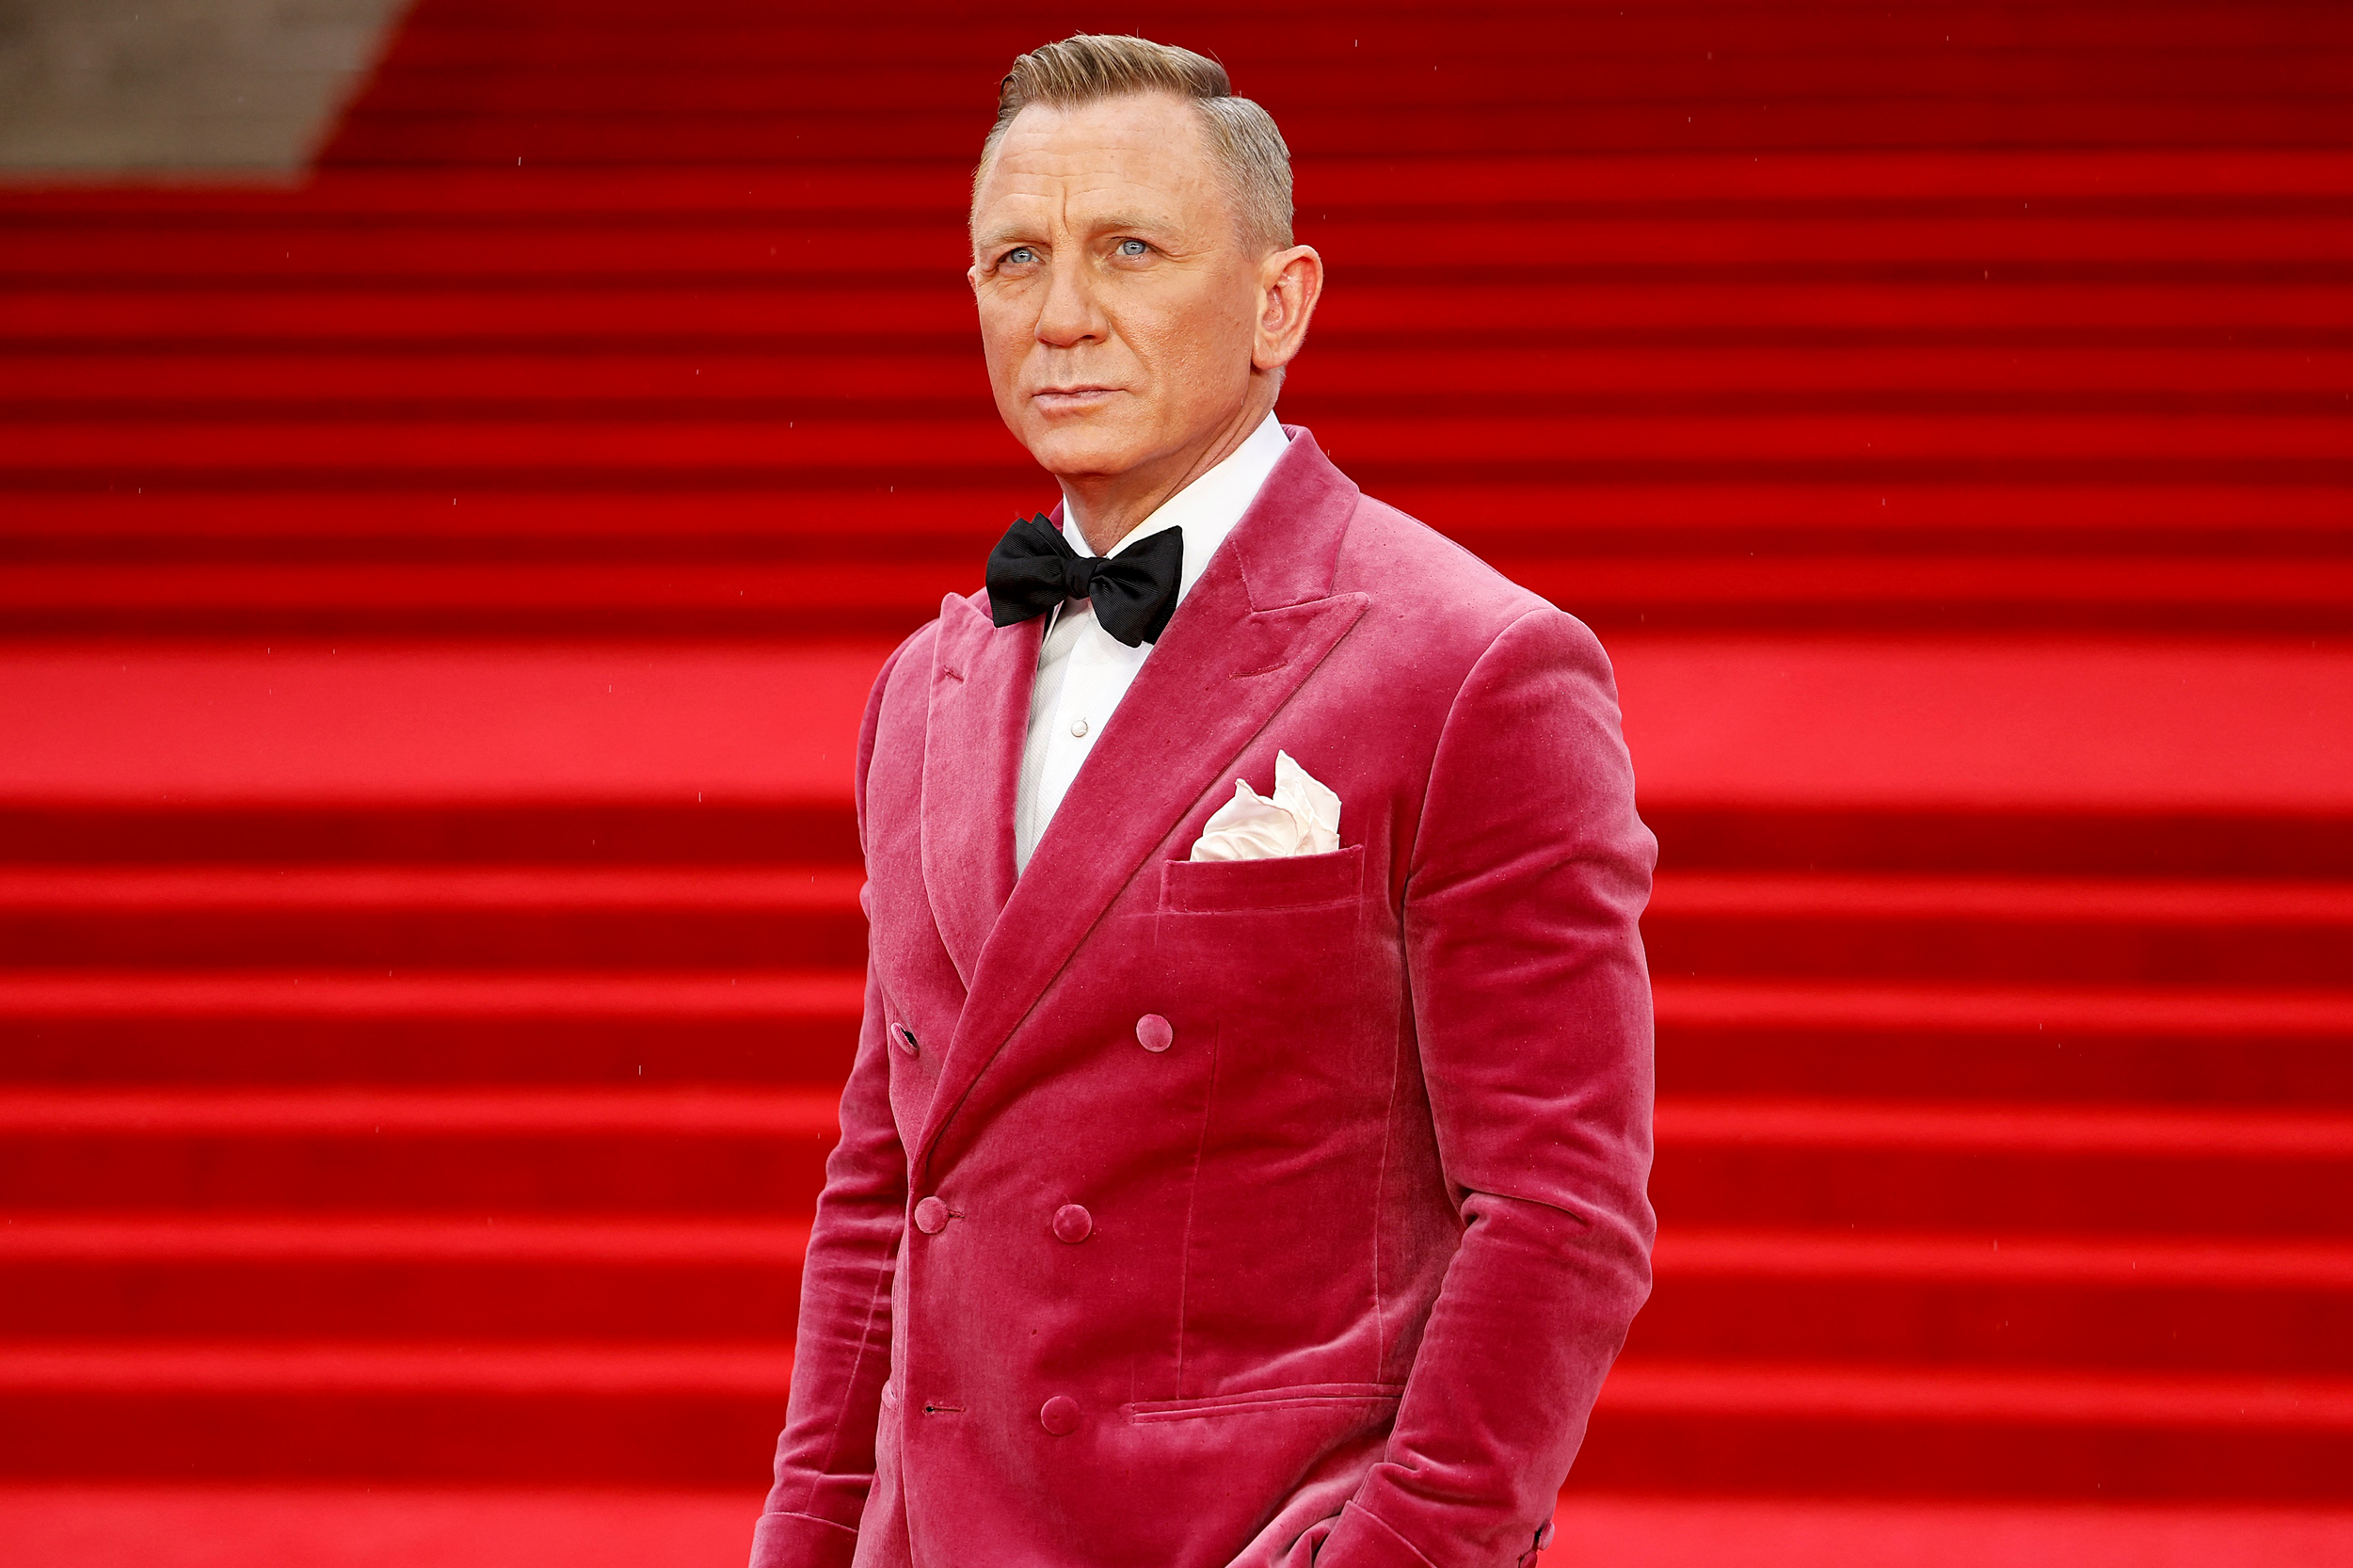 Bond is back: 007 film 'No Time To Die' premieres in London